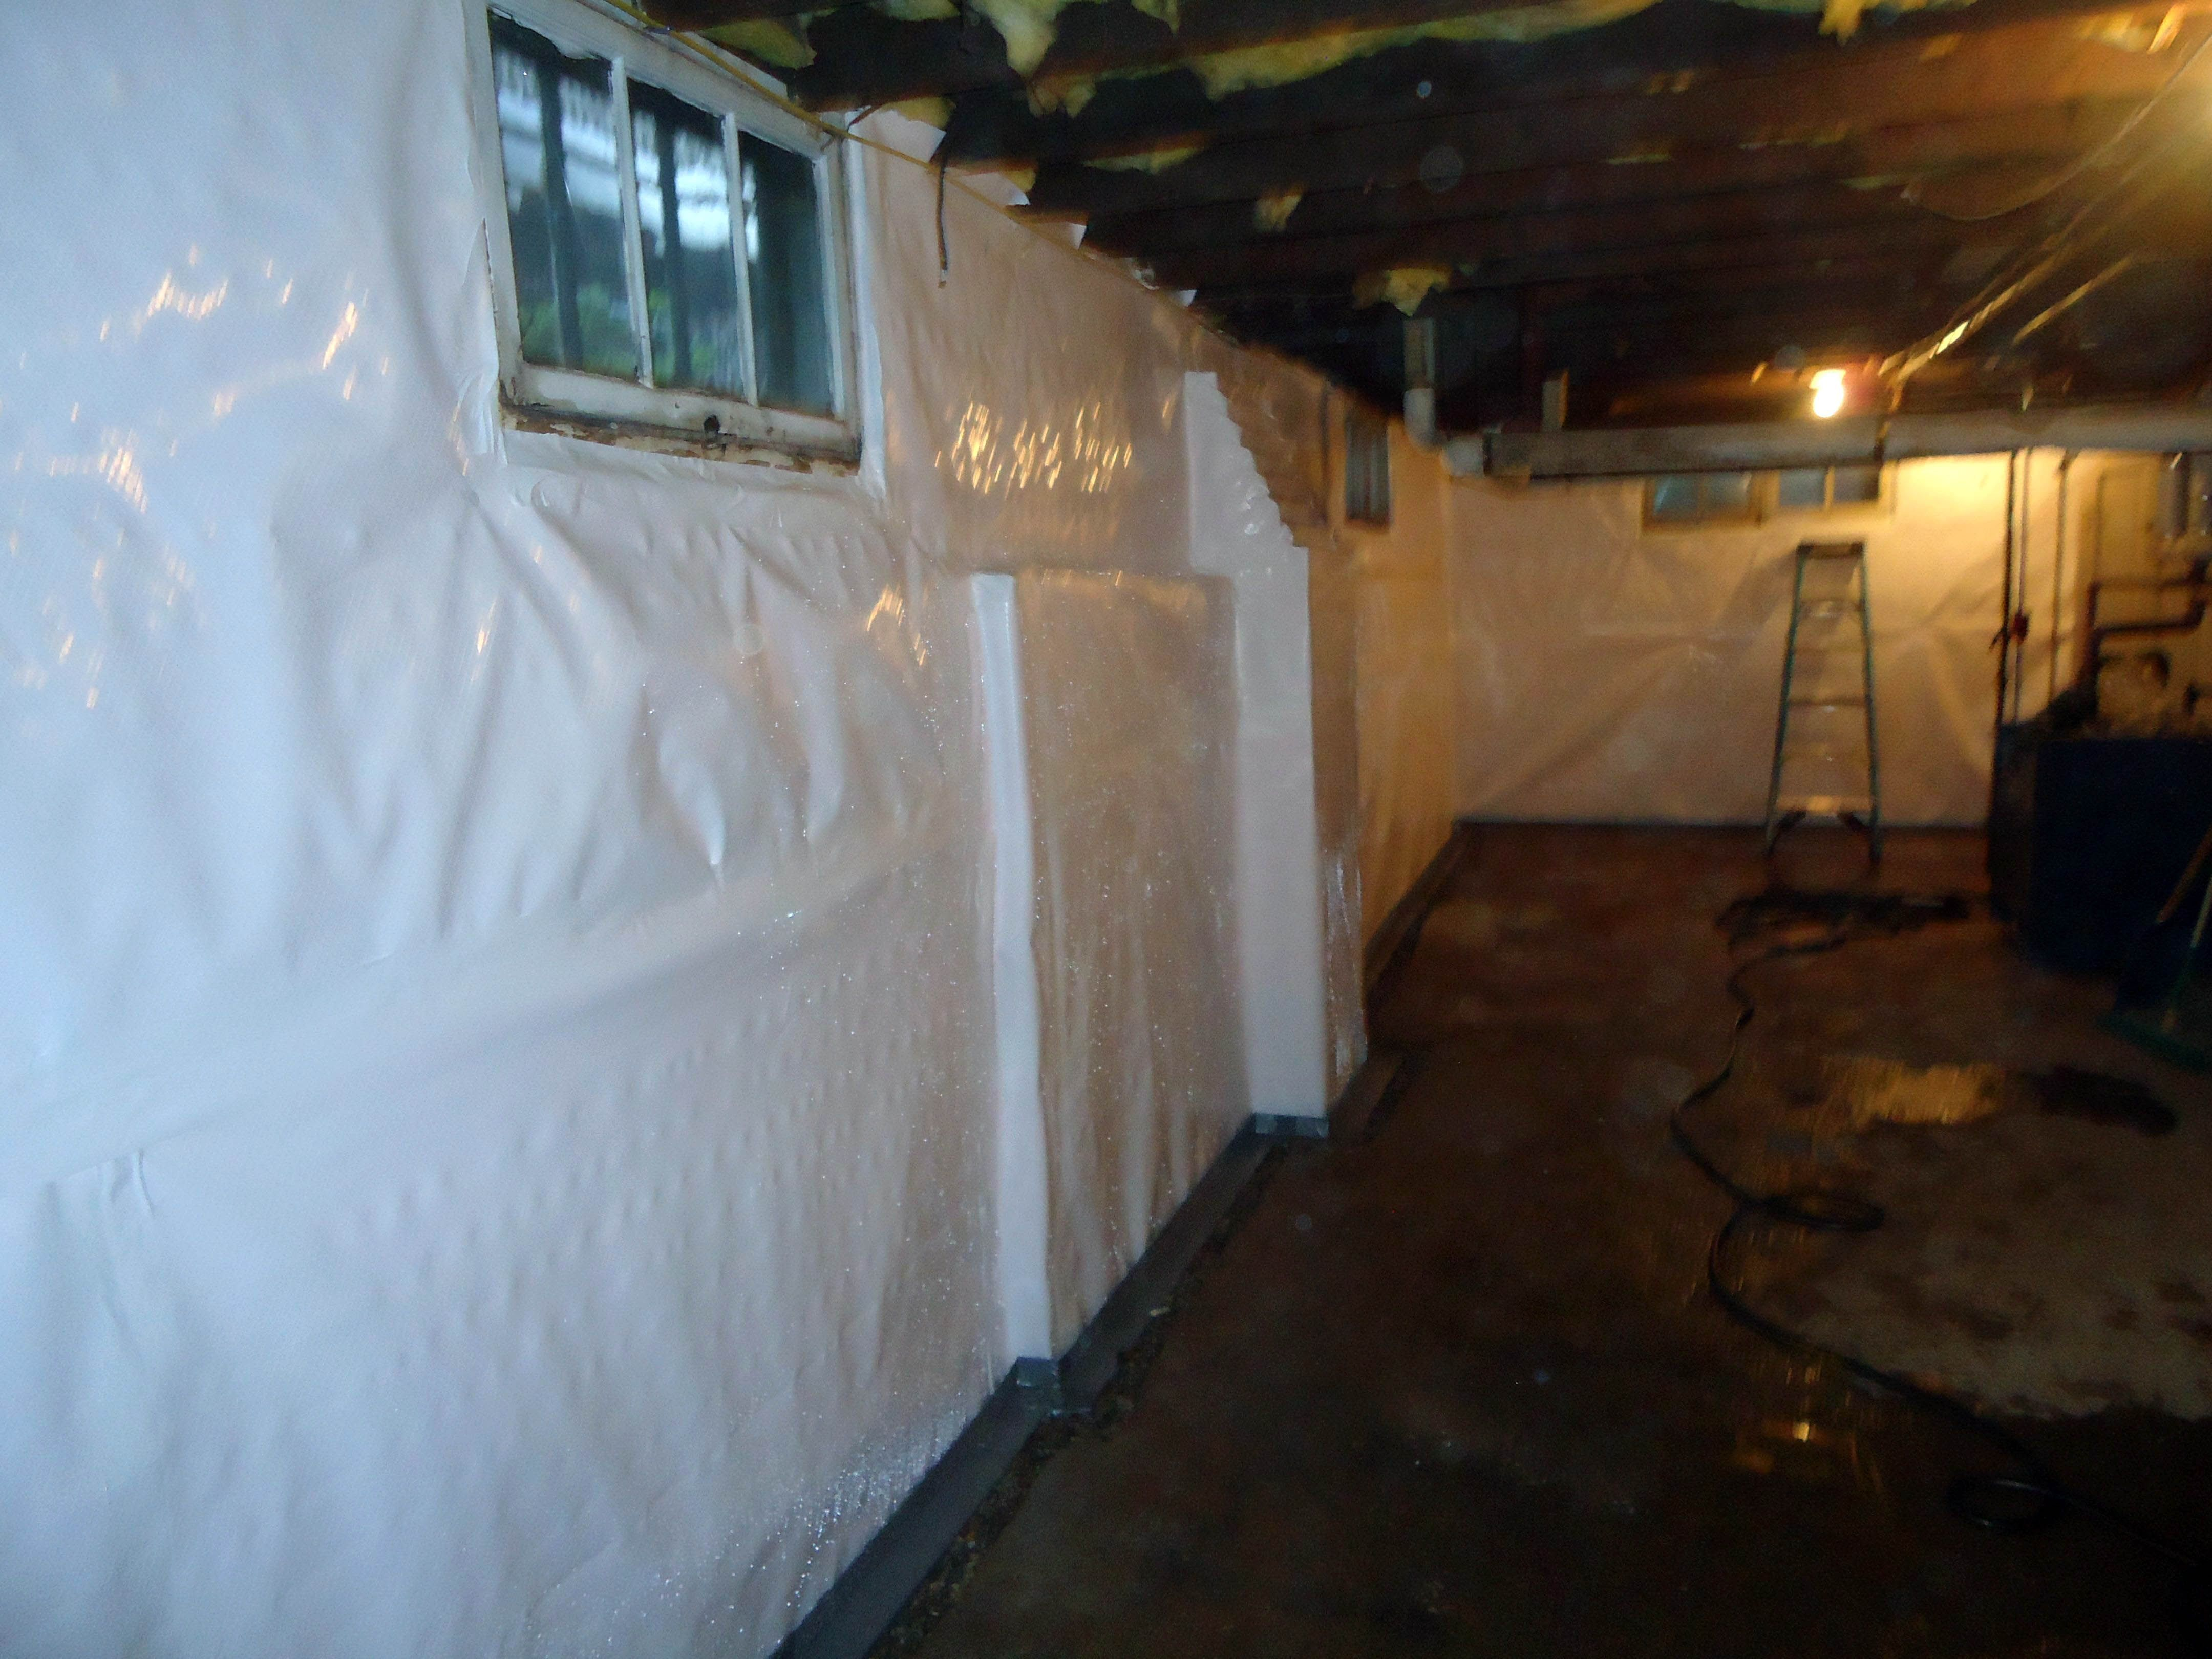 Finest Basement Waterproofing Epoxy To Refresh Your Home Waterproofing Basement Basement Flooring Basement Flooring Options